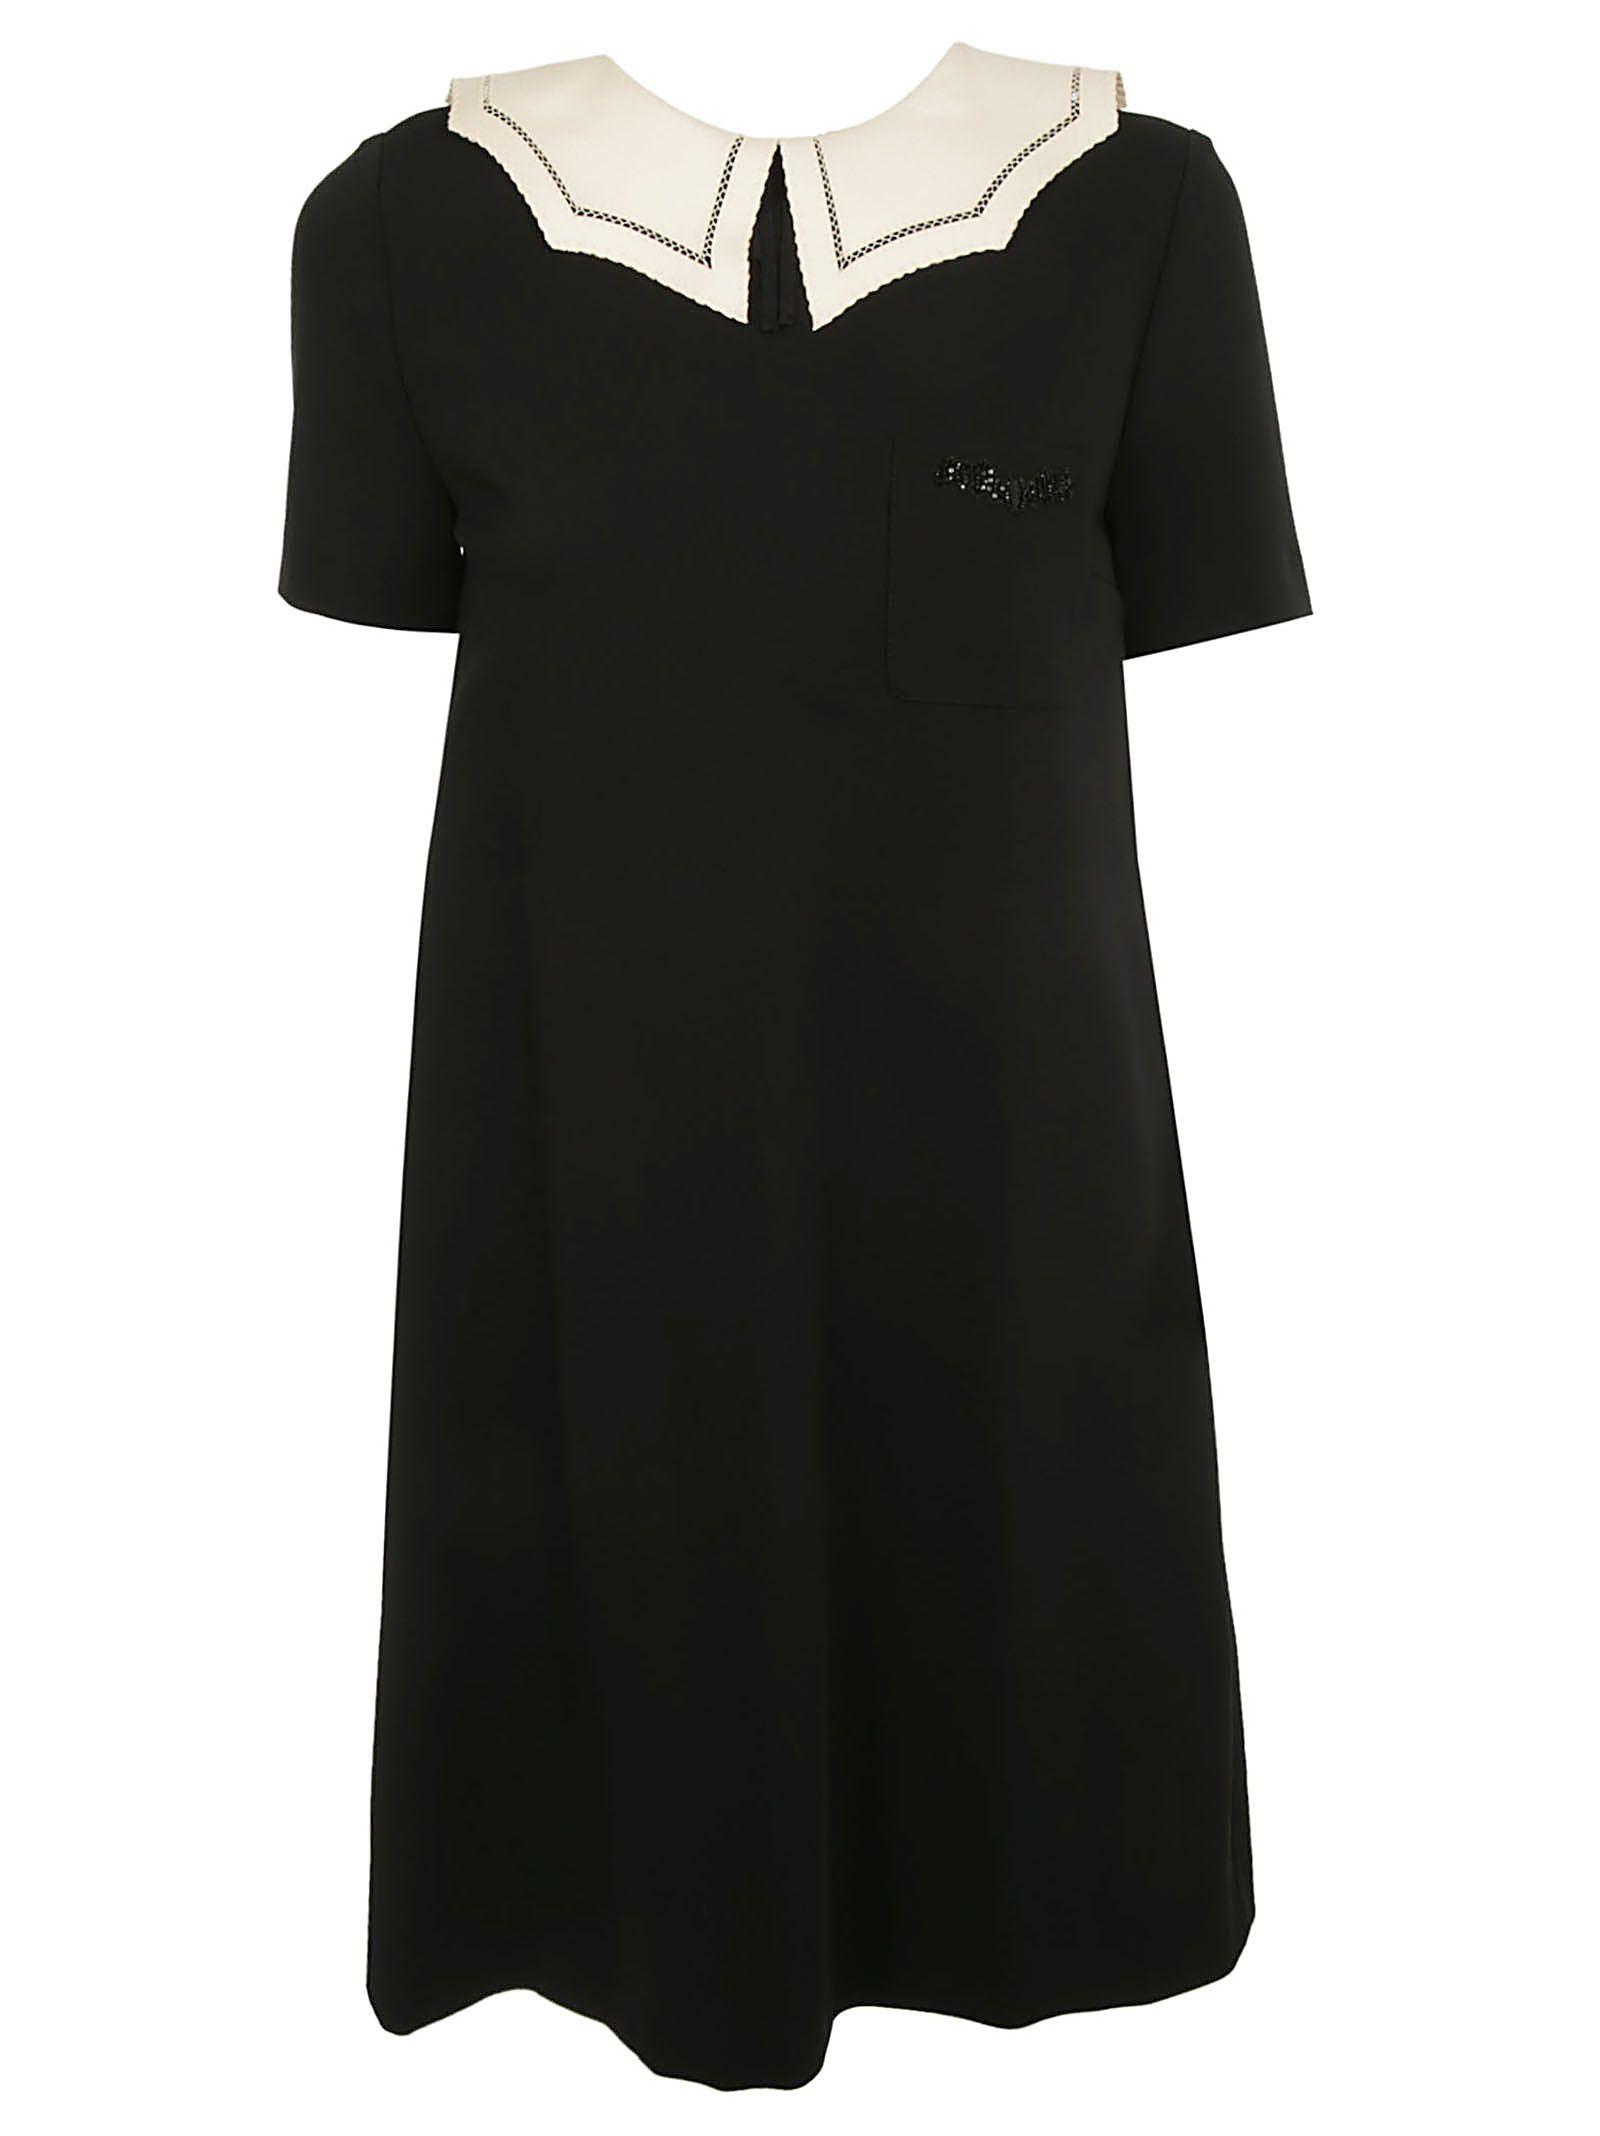 Gucci Silks EMBELLISHED DRESS